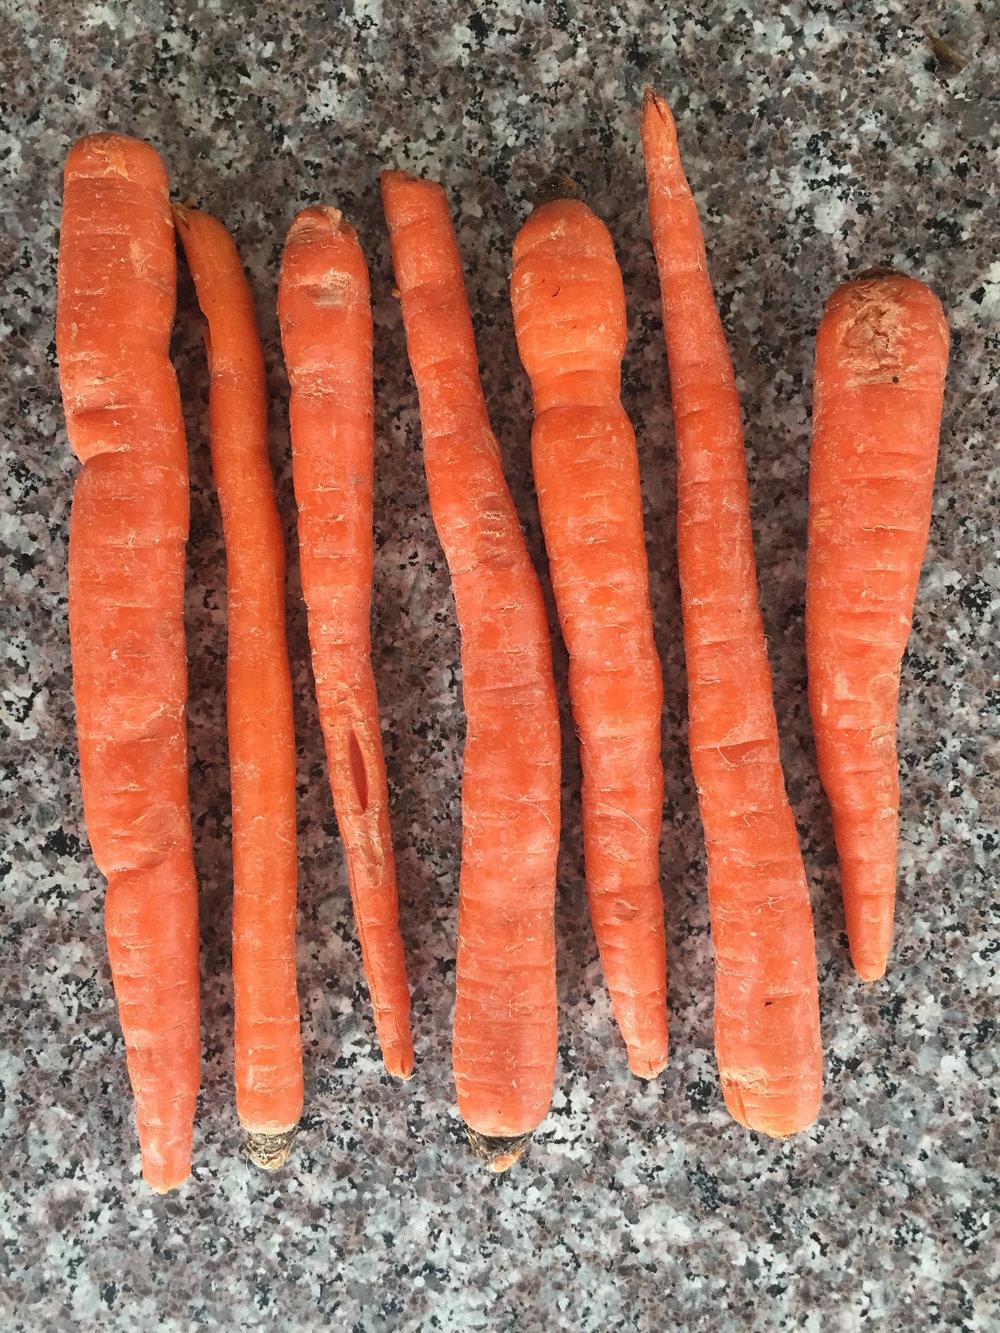 raw unpeeled carrots